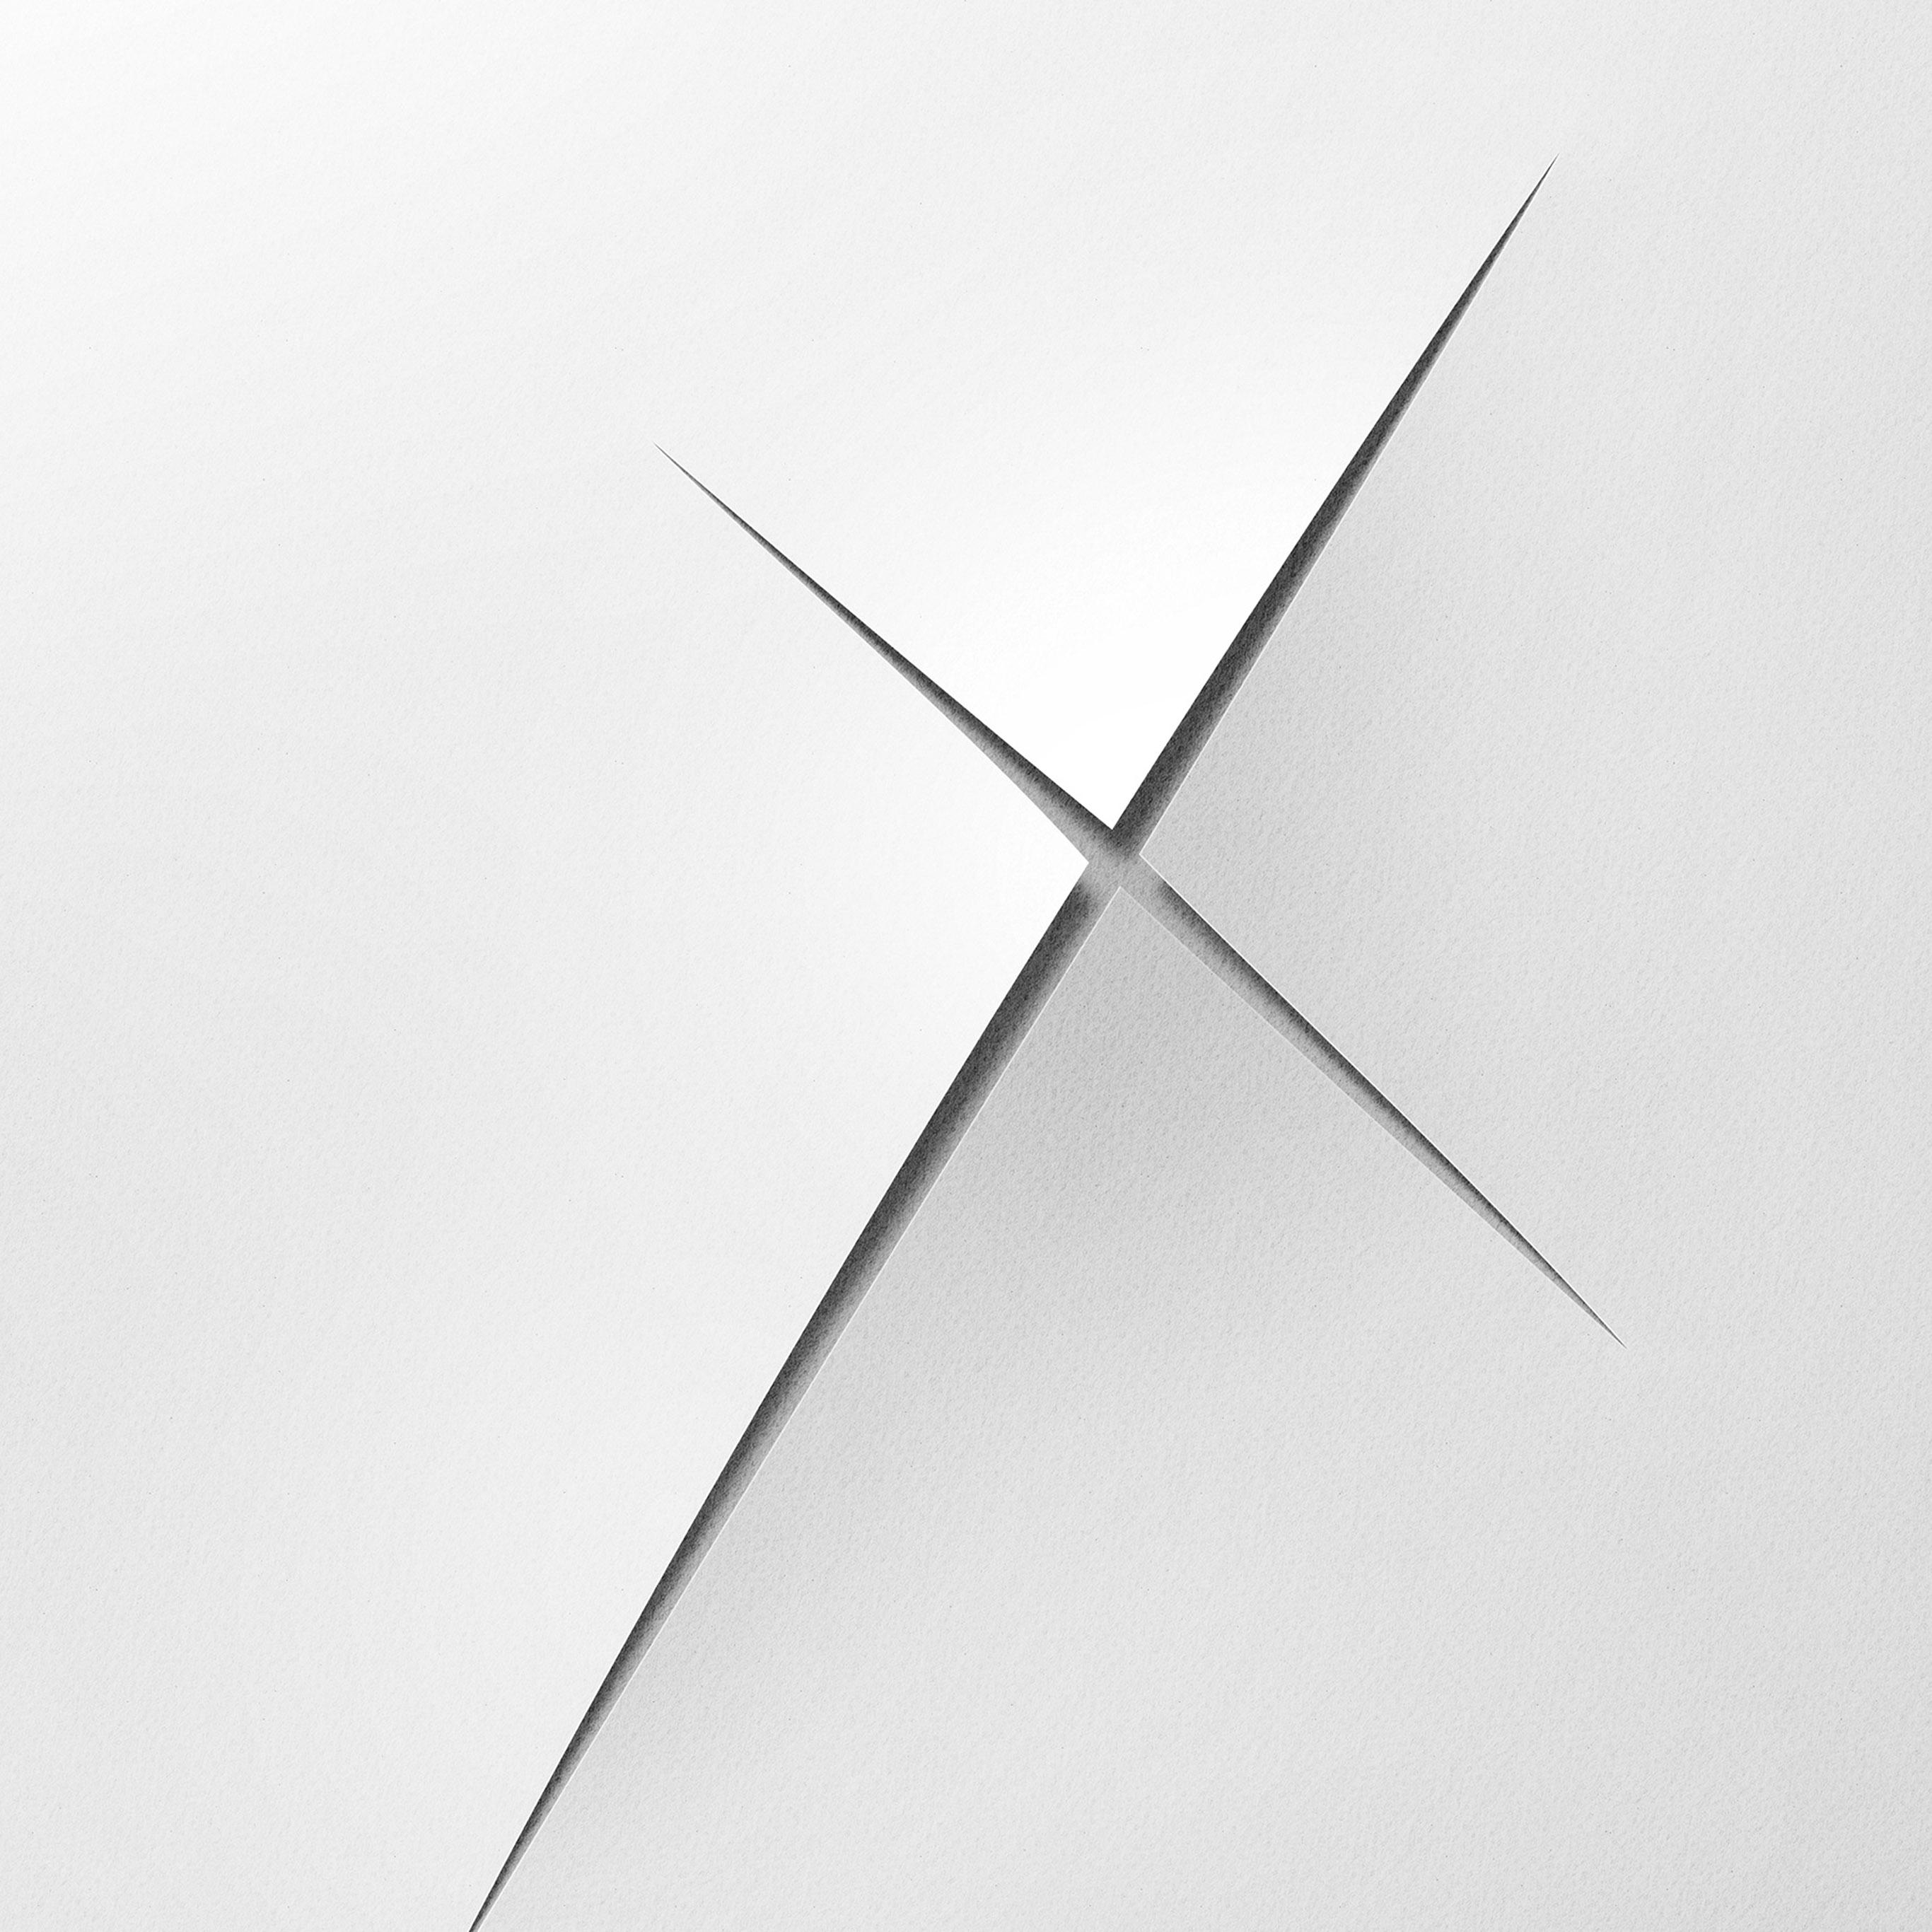 Bh79 White Cut Blank Knife Art Wallpaper